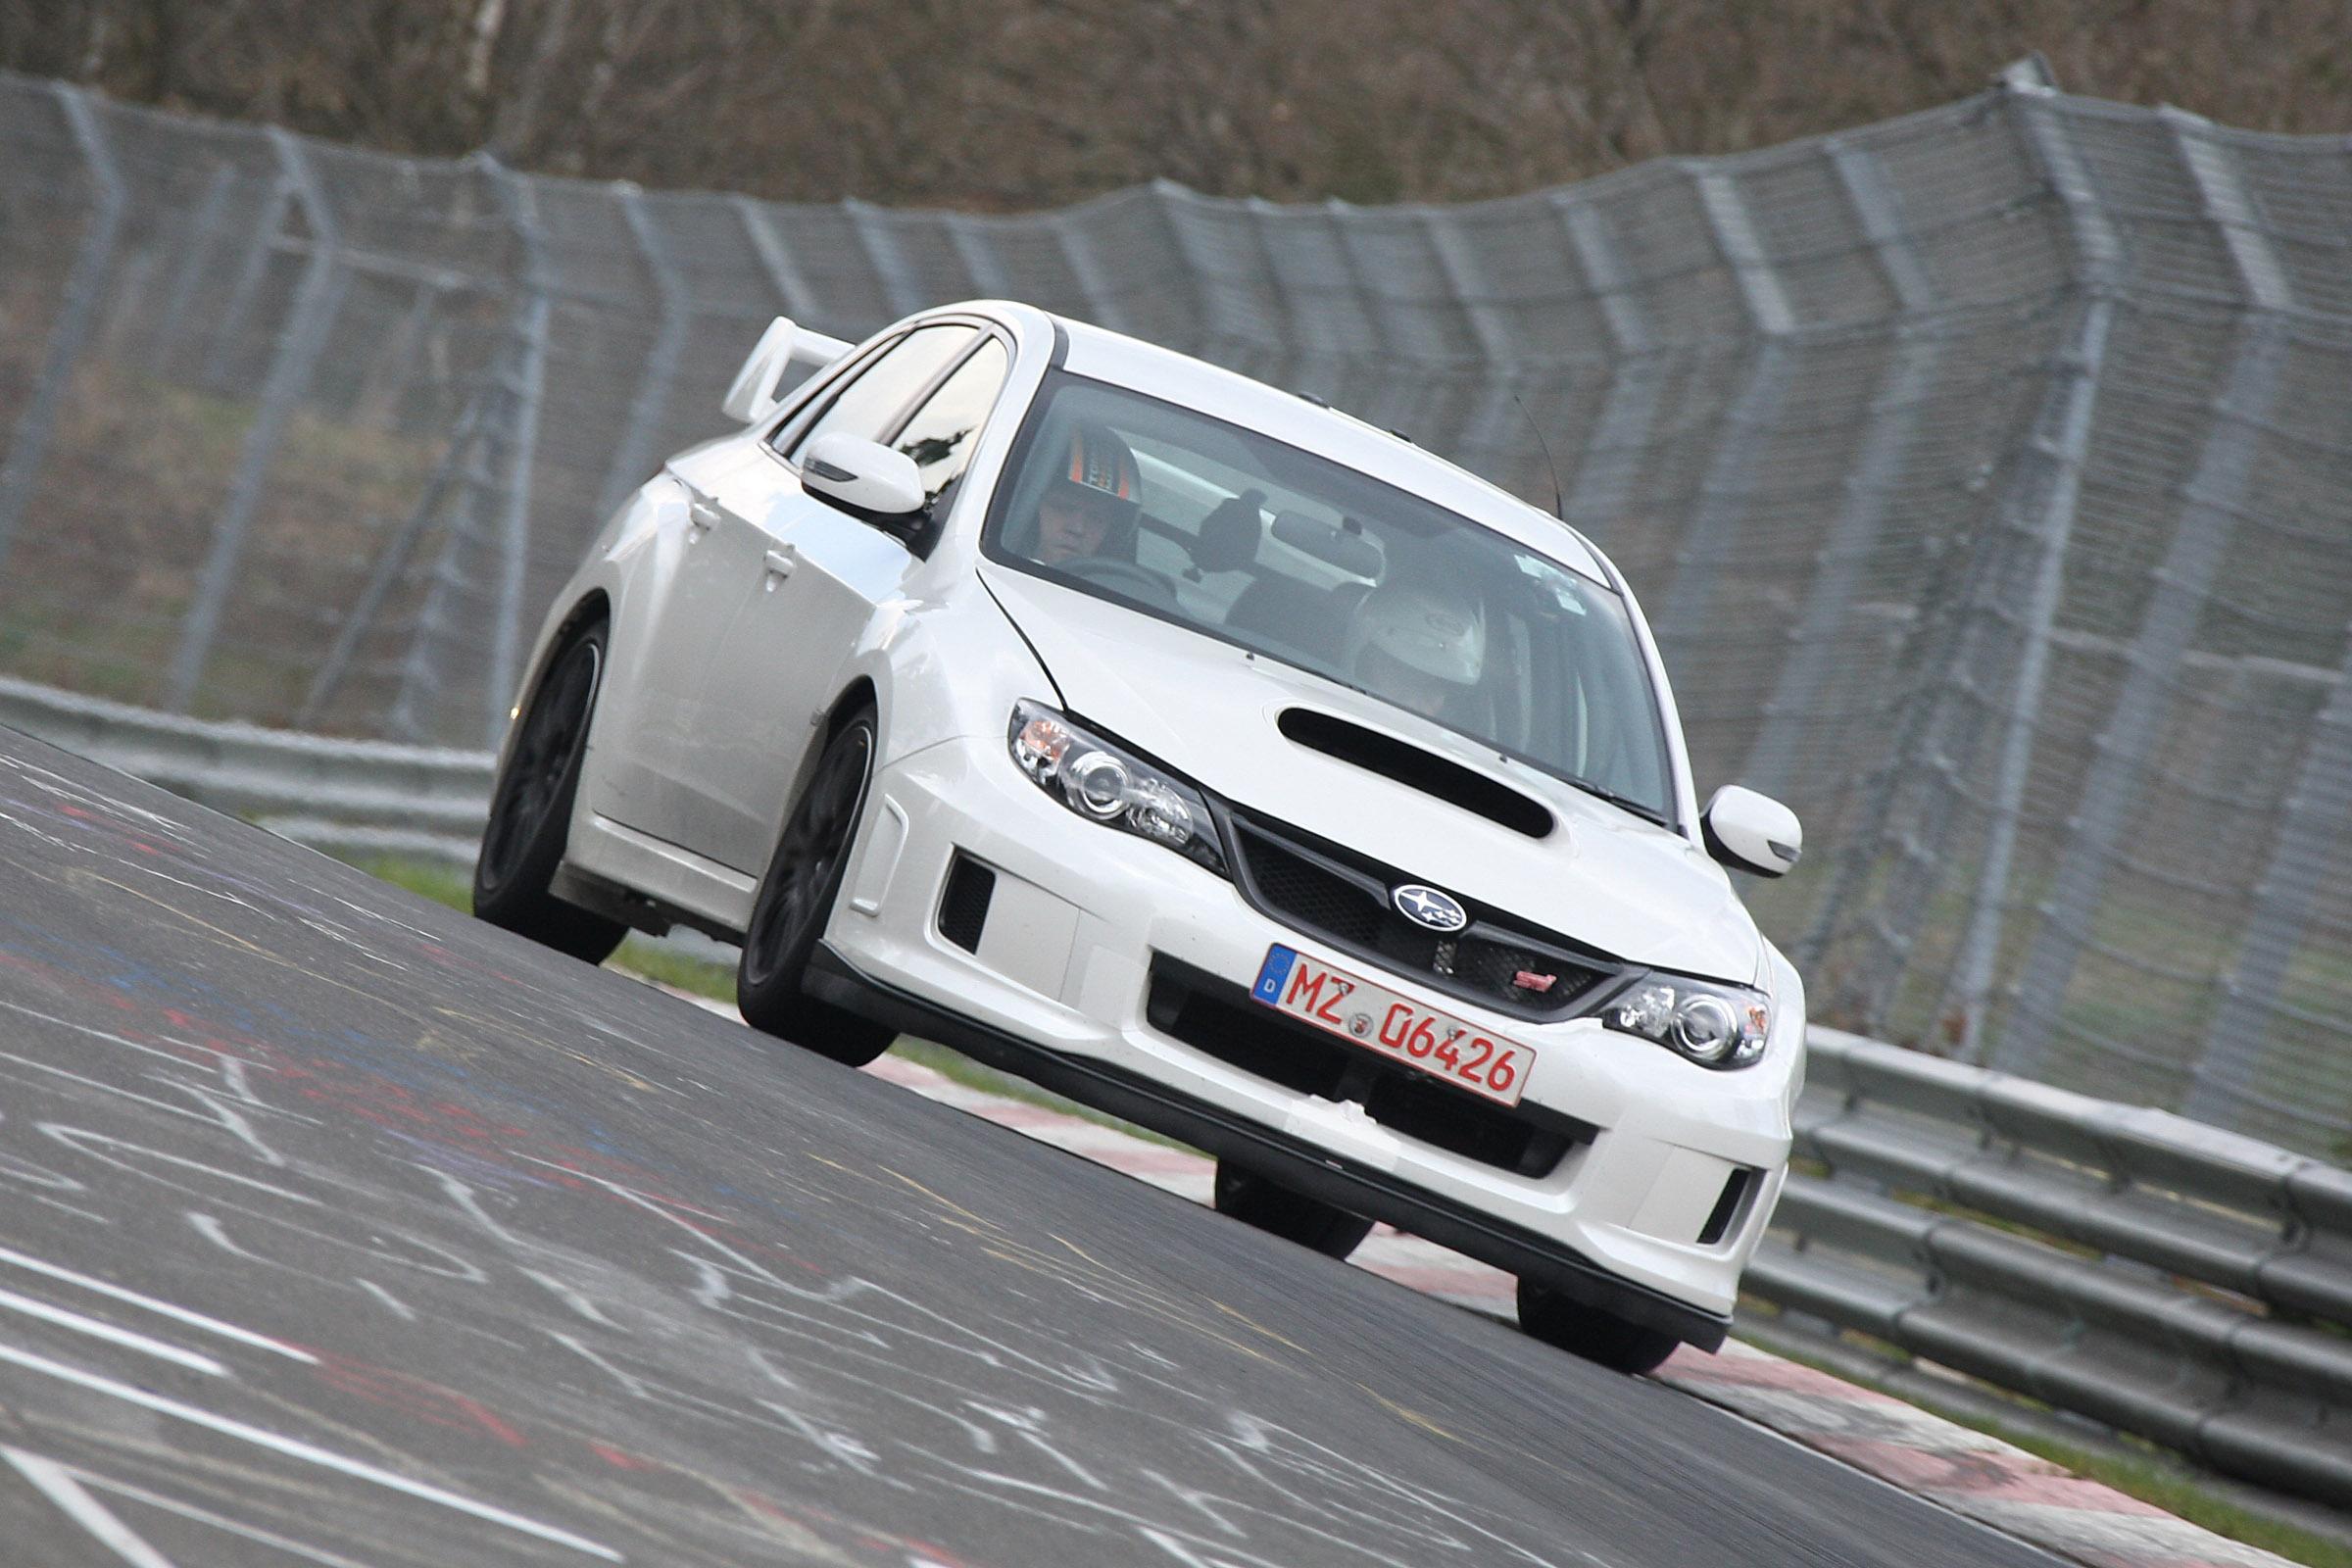 2011 Subaru WRX STi седан испытания на Нюрбургринге - фотография №16